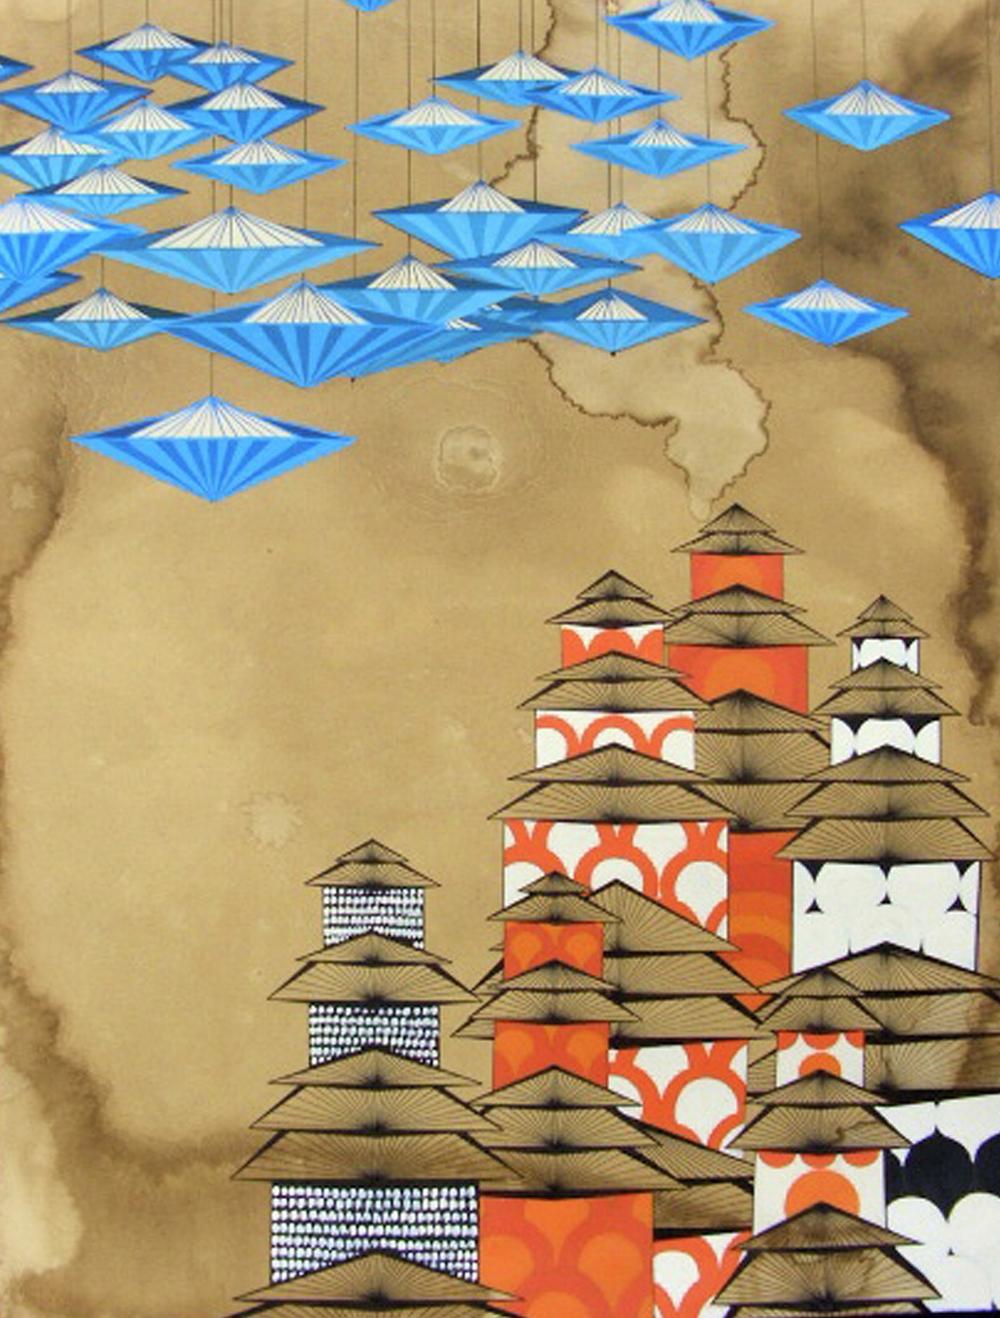 Umbrella Houses